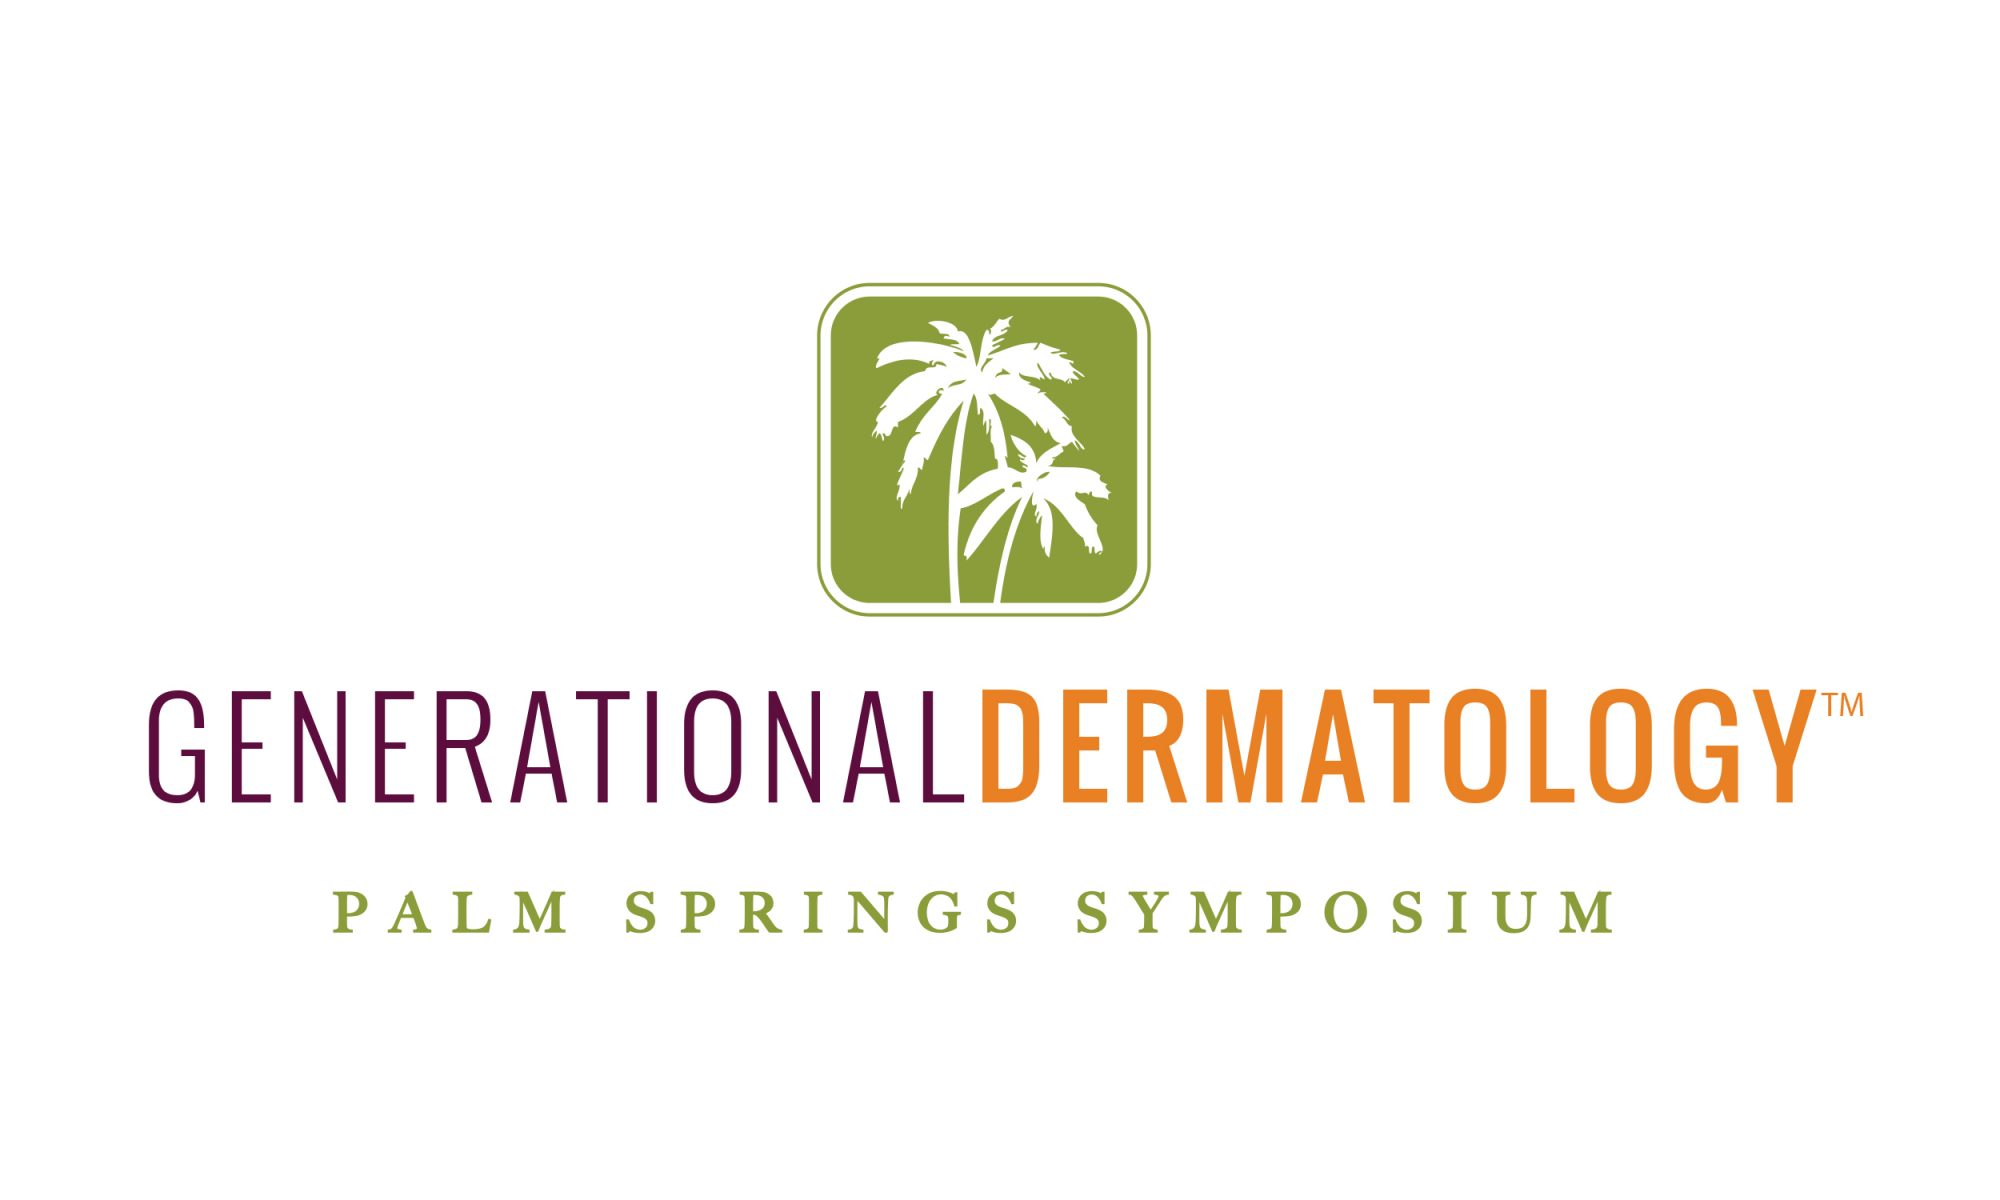 Generational Dermatology